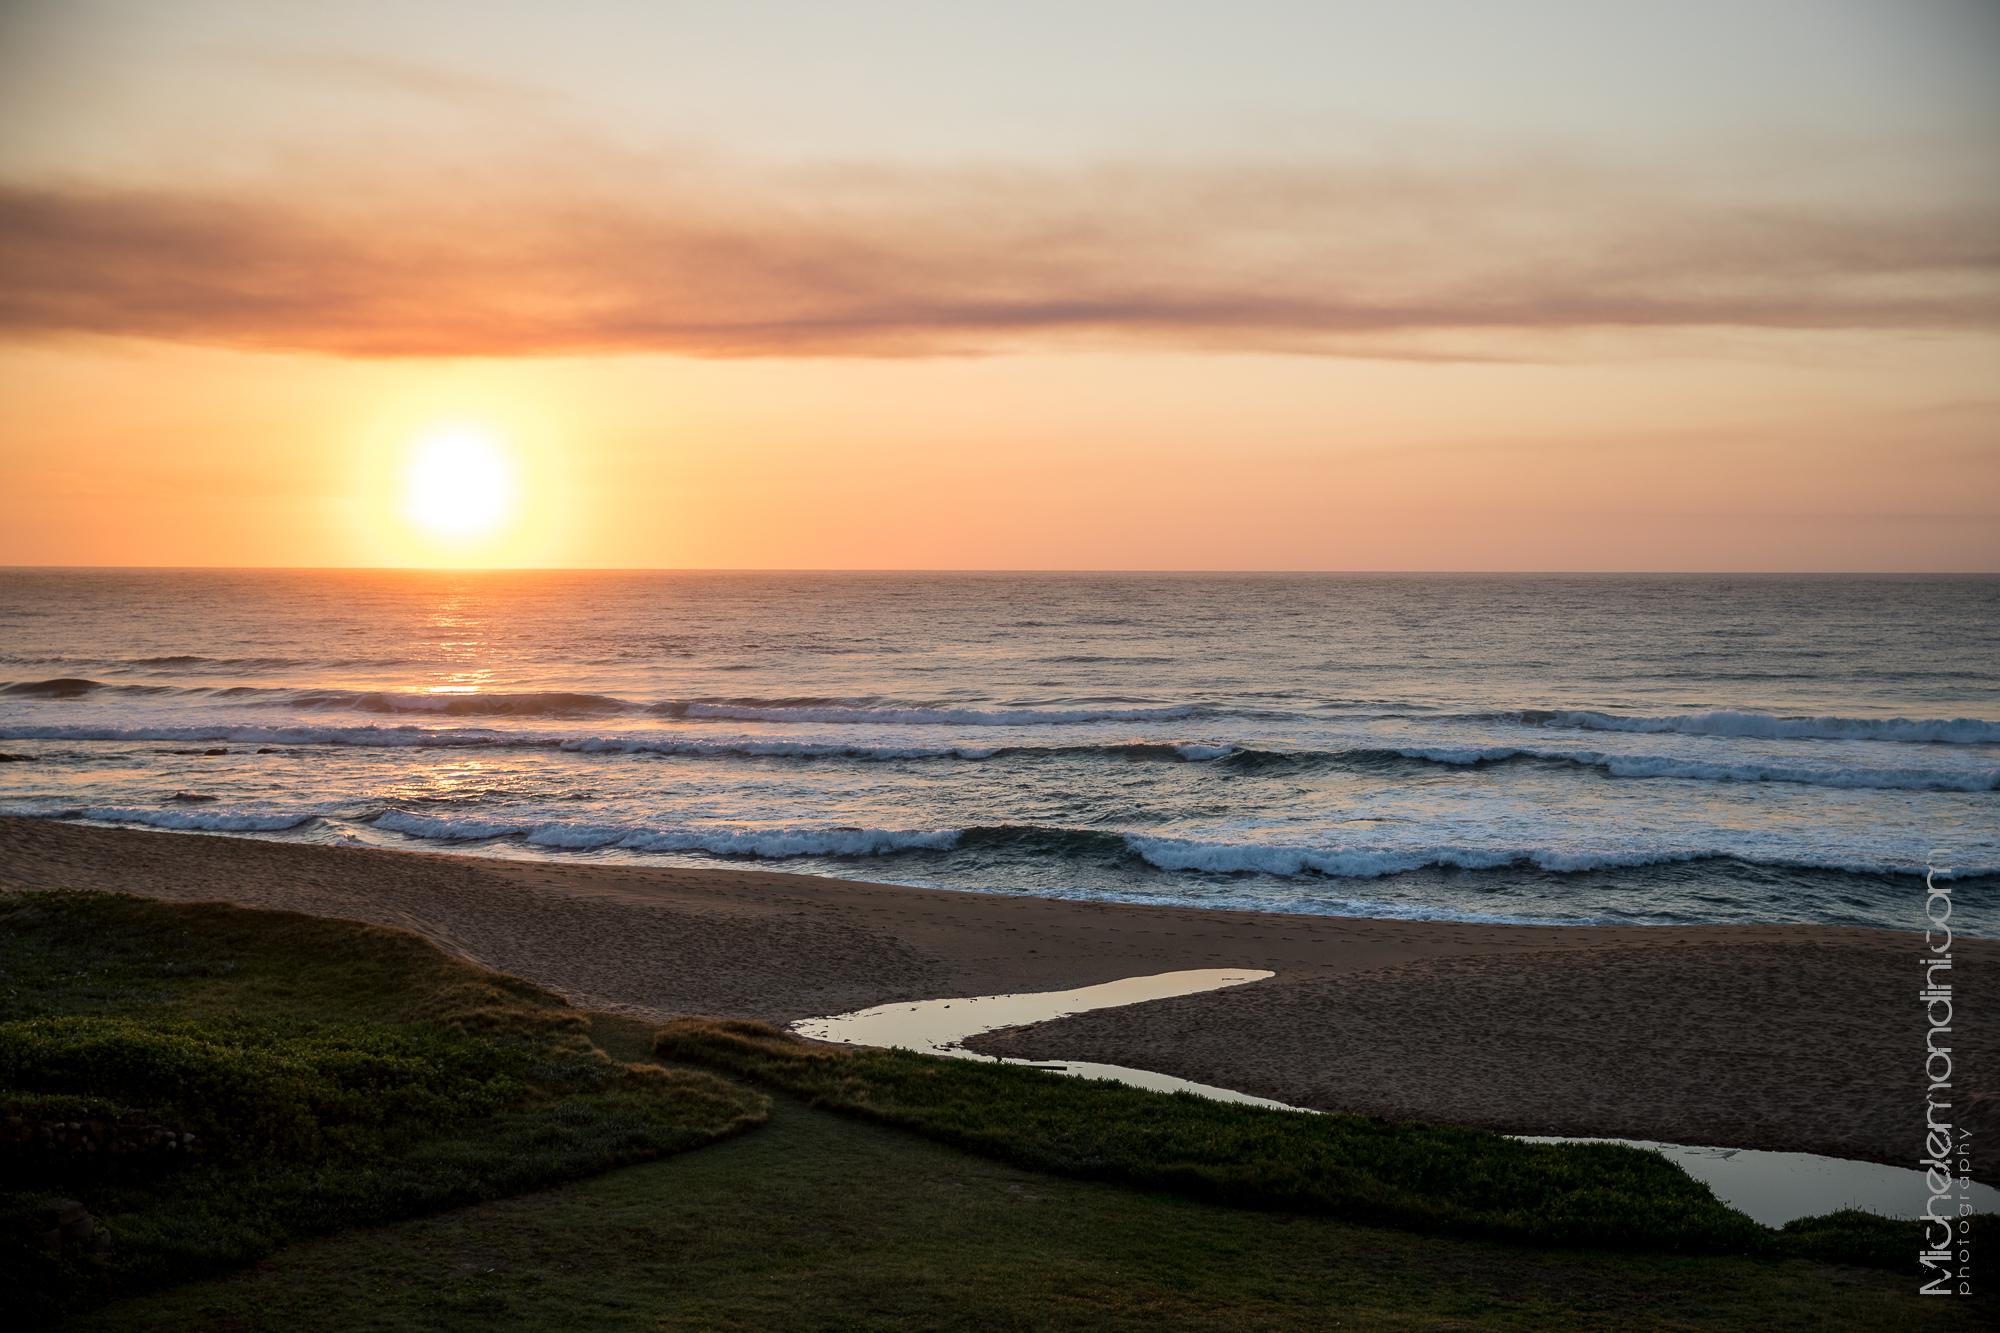 Dawn in Salt Rock - Durban - South Africa - Ph: Michele Mondini